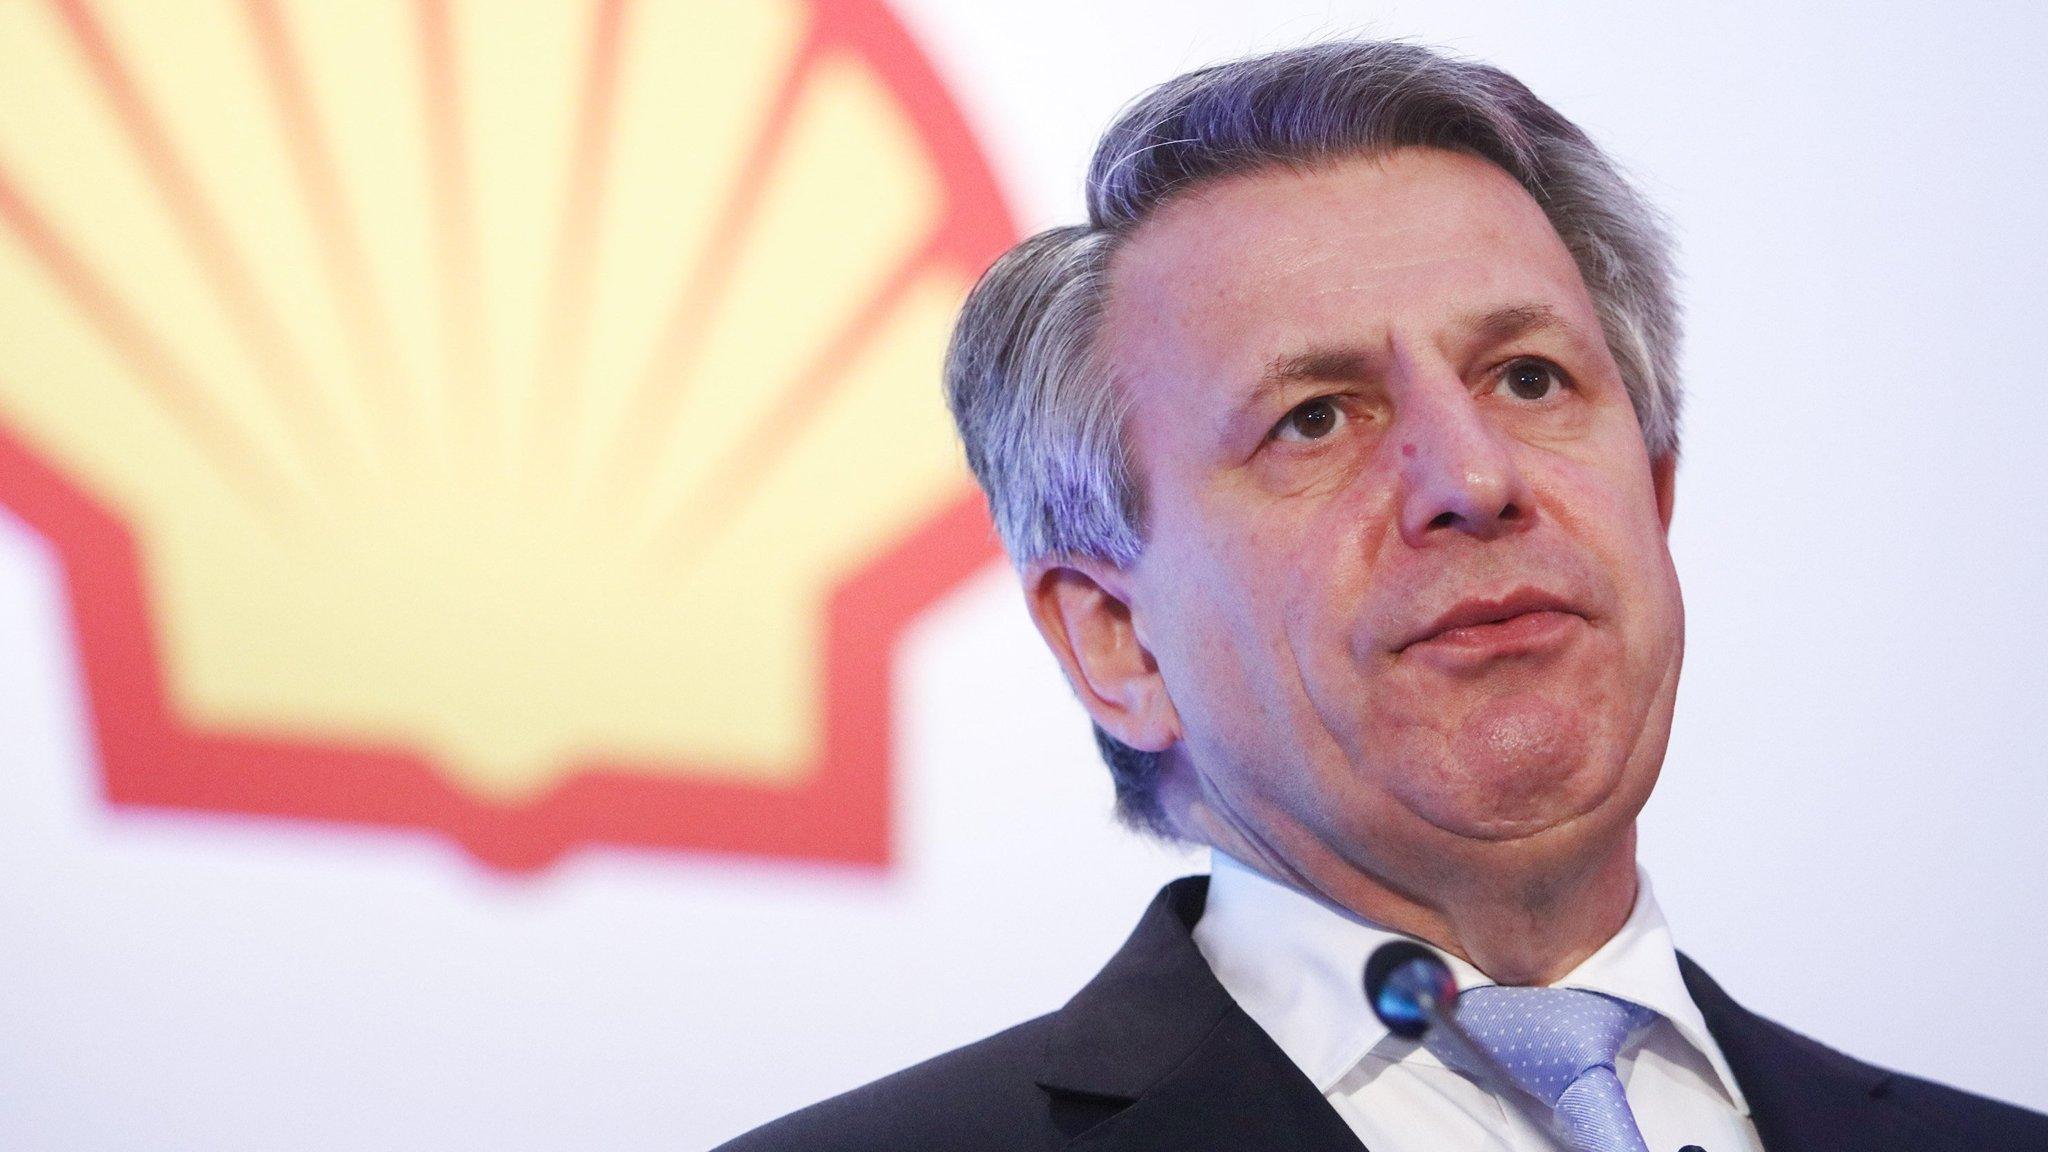 Shell's strategic move into electricity